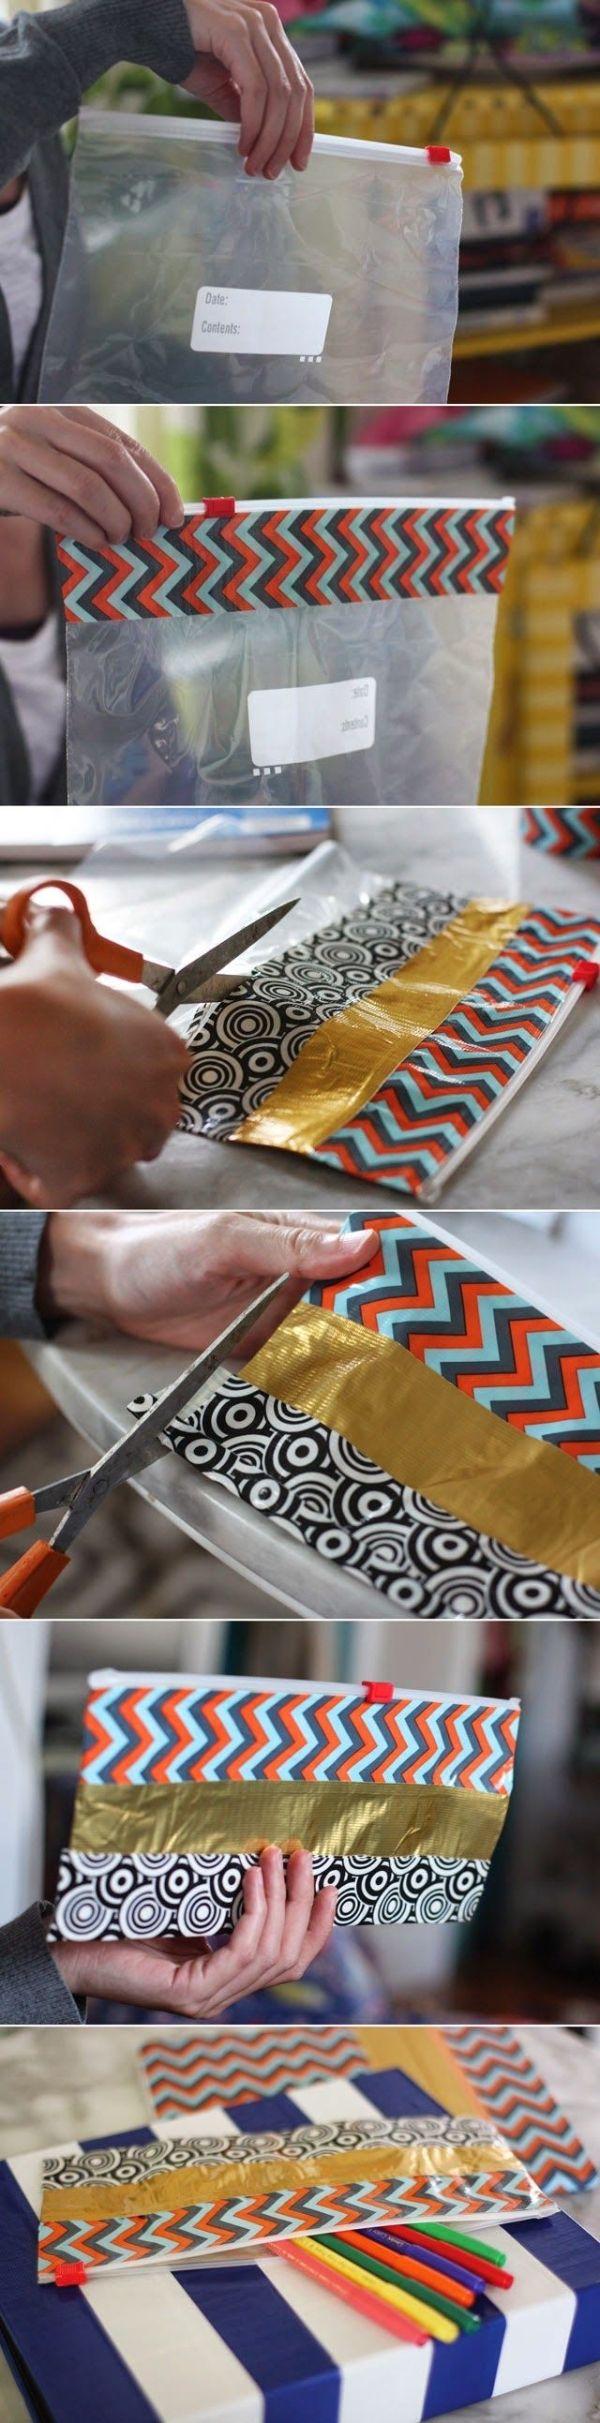 Duct Tape + ziplock bag = diy Pencil case by cheri